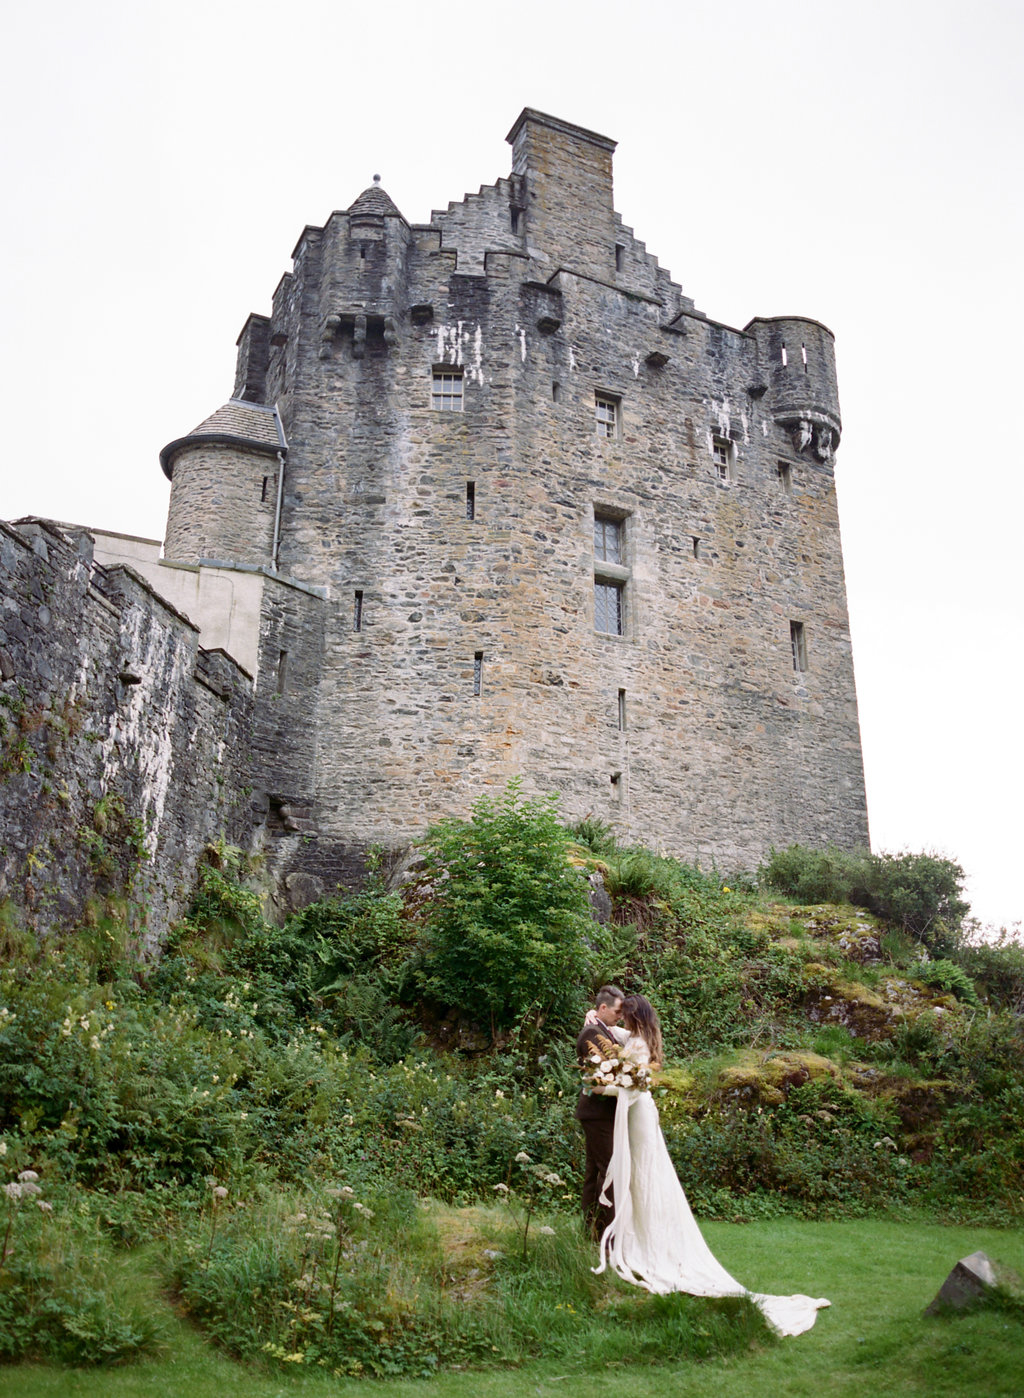 Scotland-Prewedding-highlands-castle-Engagment-Photos-Katie-Grant (124 of 139).jpg